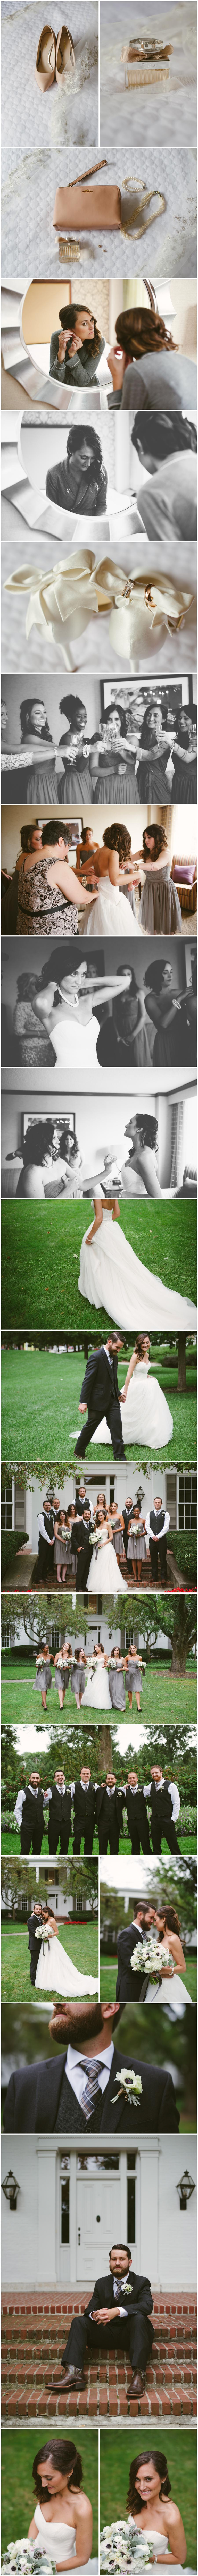 Blog Collage-LindseyEricW2